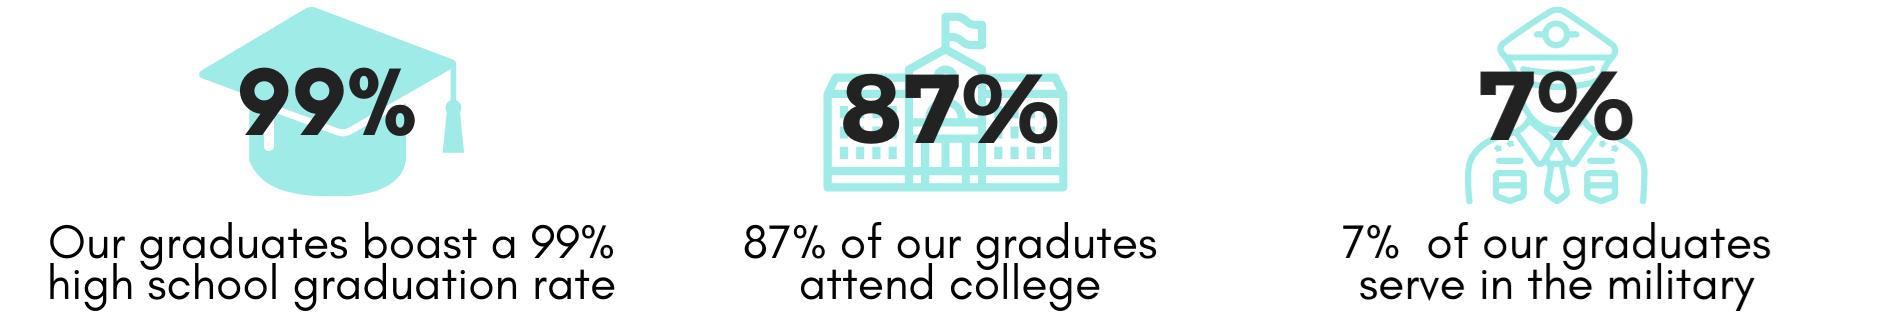 Graduate Support Statistics